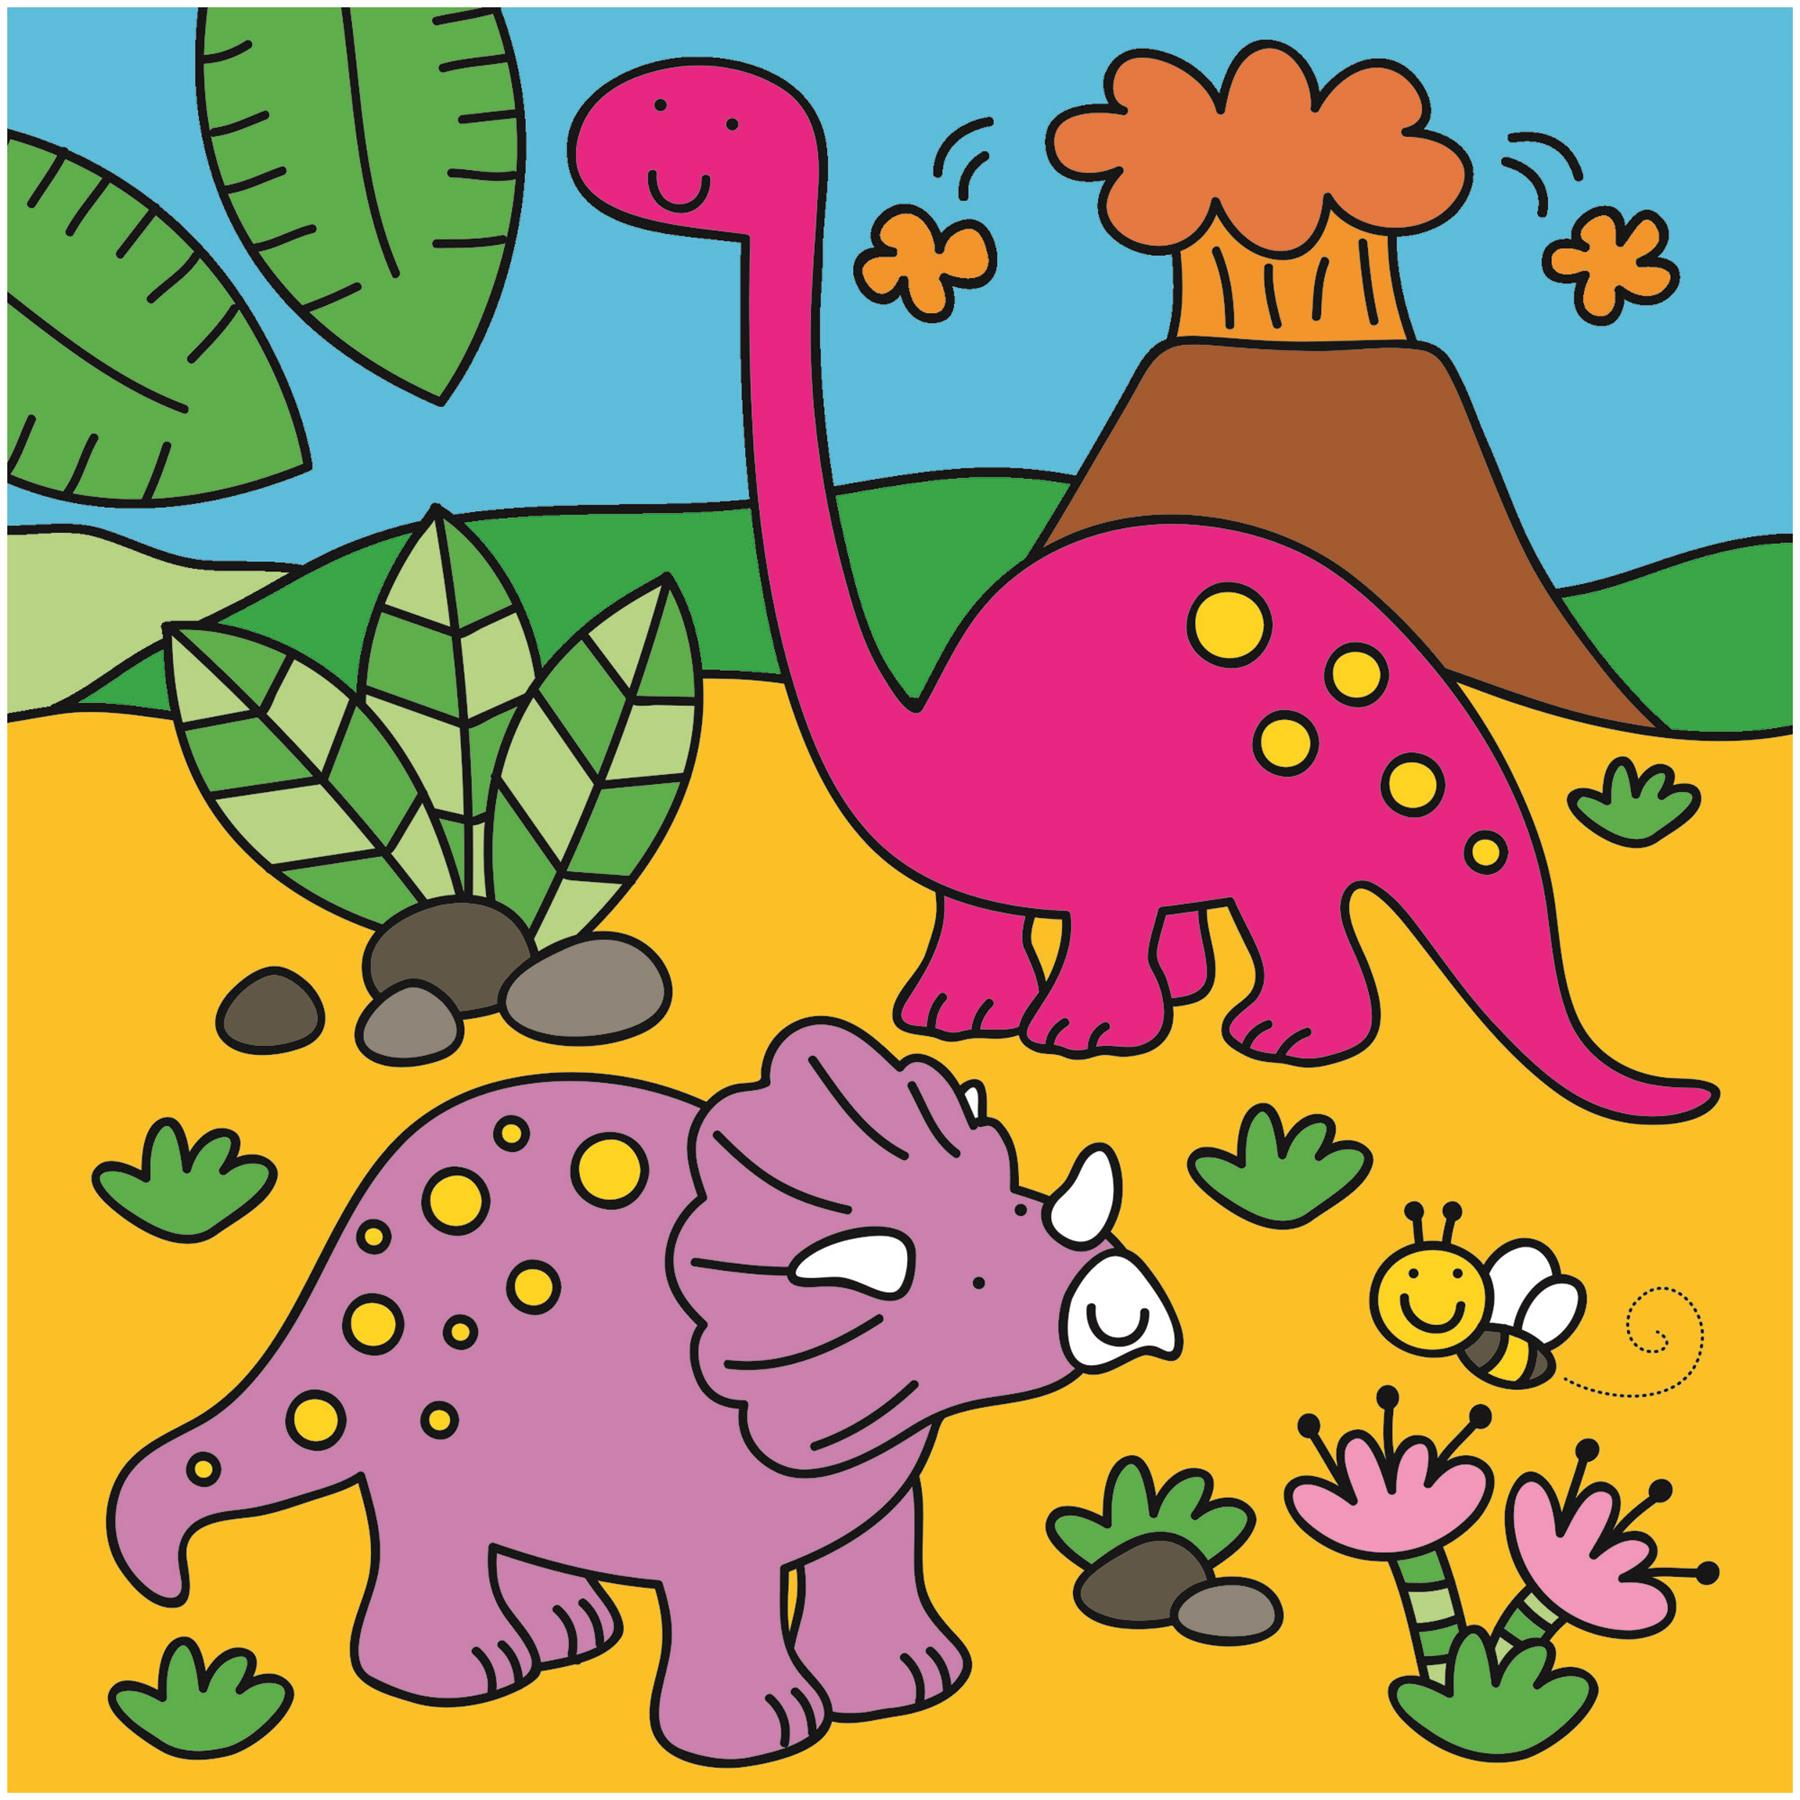 Galt FUN TO COLOUR BOOK Kids Art Craft Toy BN